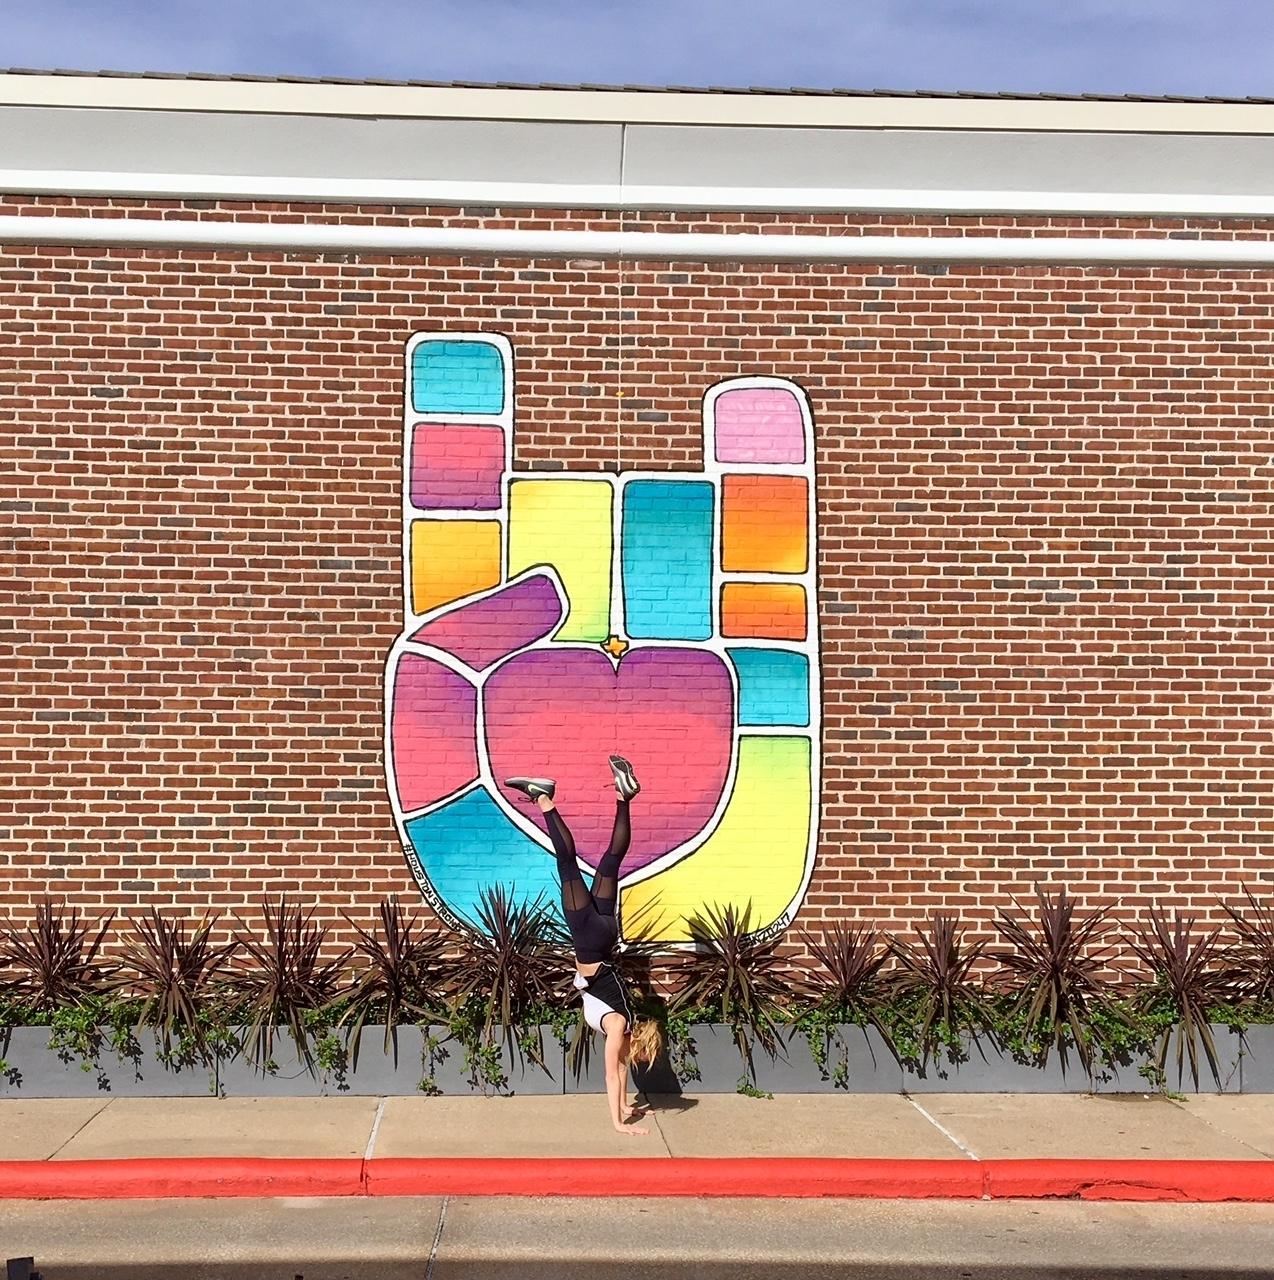 10 Walls To Visit In Houston In 2018   It's Not Hou It's Me Inside Houston Wall Art (Photo 20 of 20)